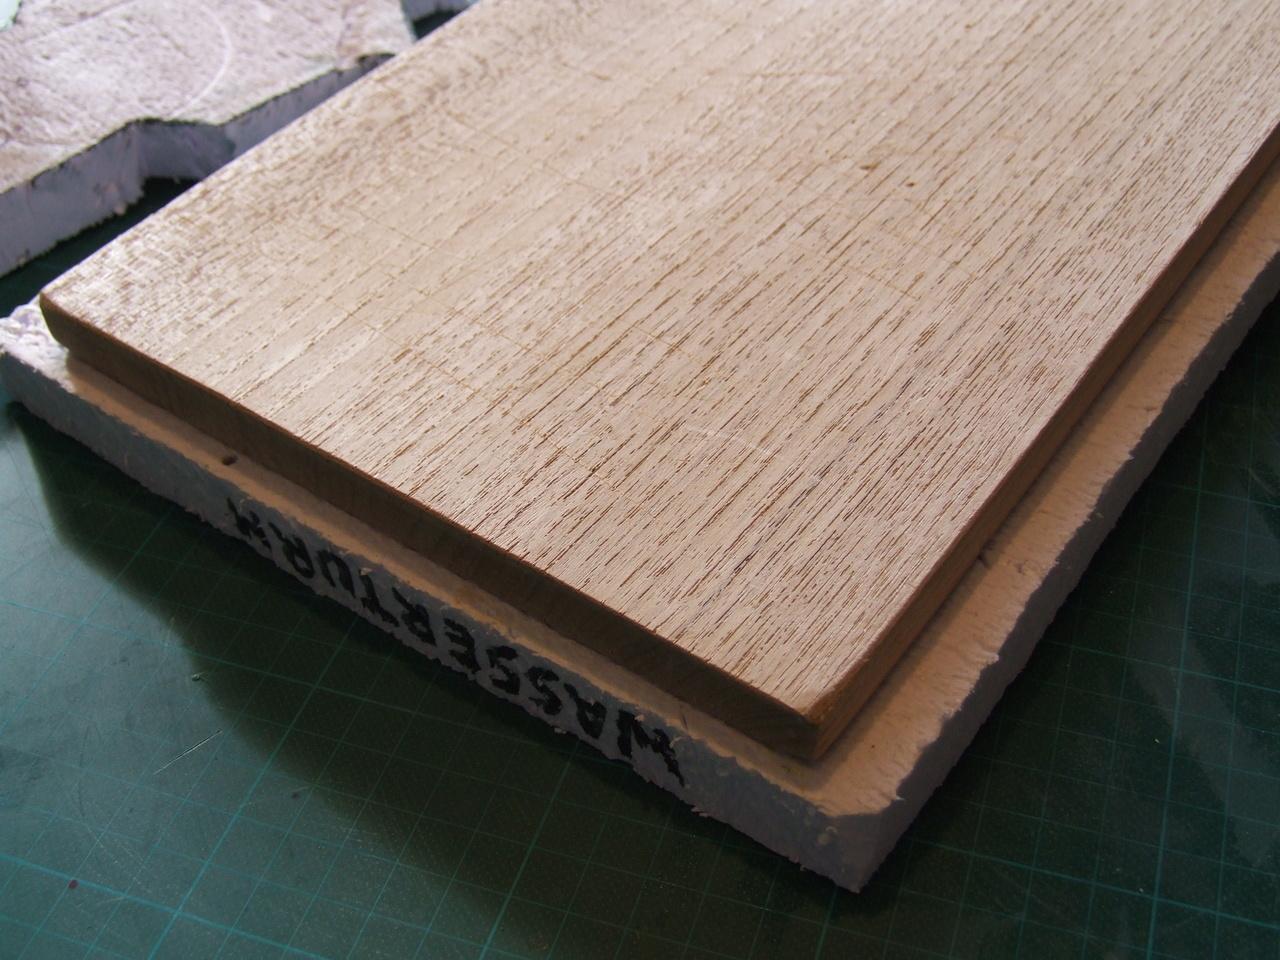 betonplatten selbst herstellen betonplatten selber machen rheumri 44 betonplatten selber. Black Bedroom Furniture Sets. Home Design Ideas